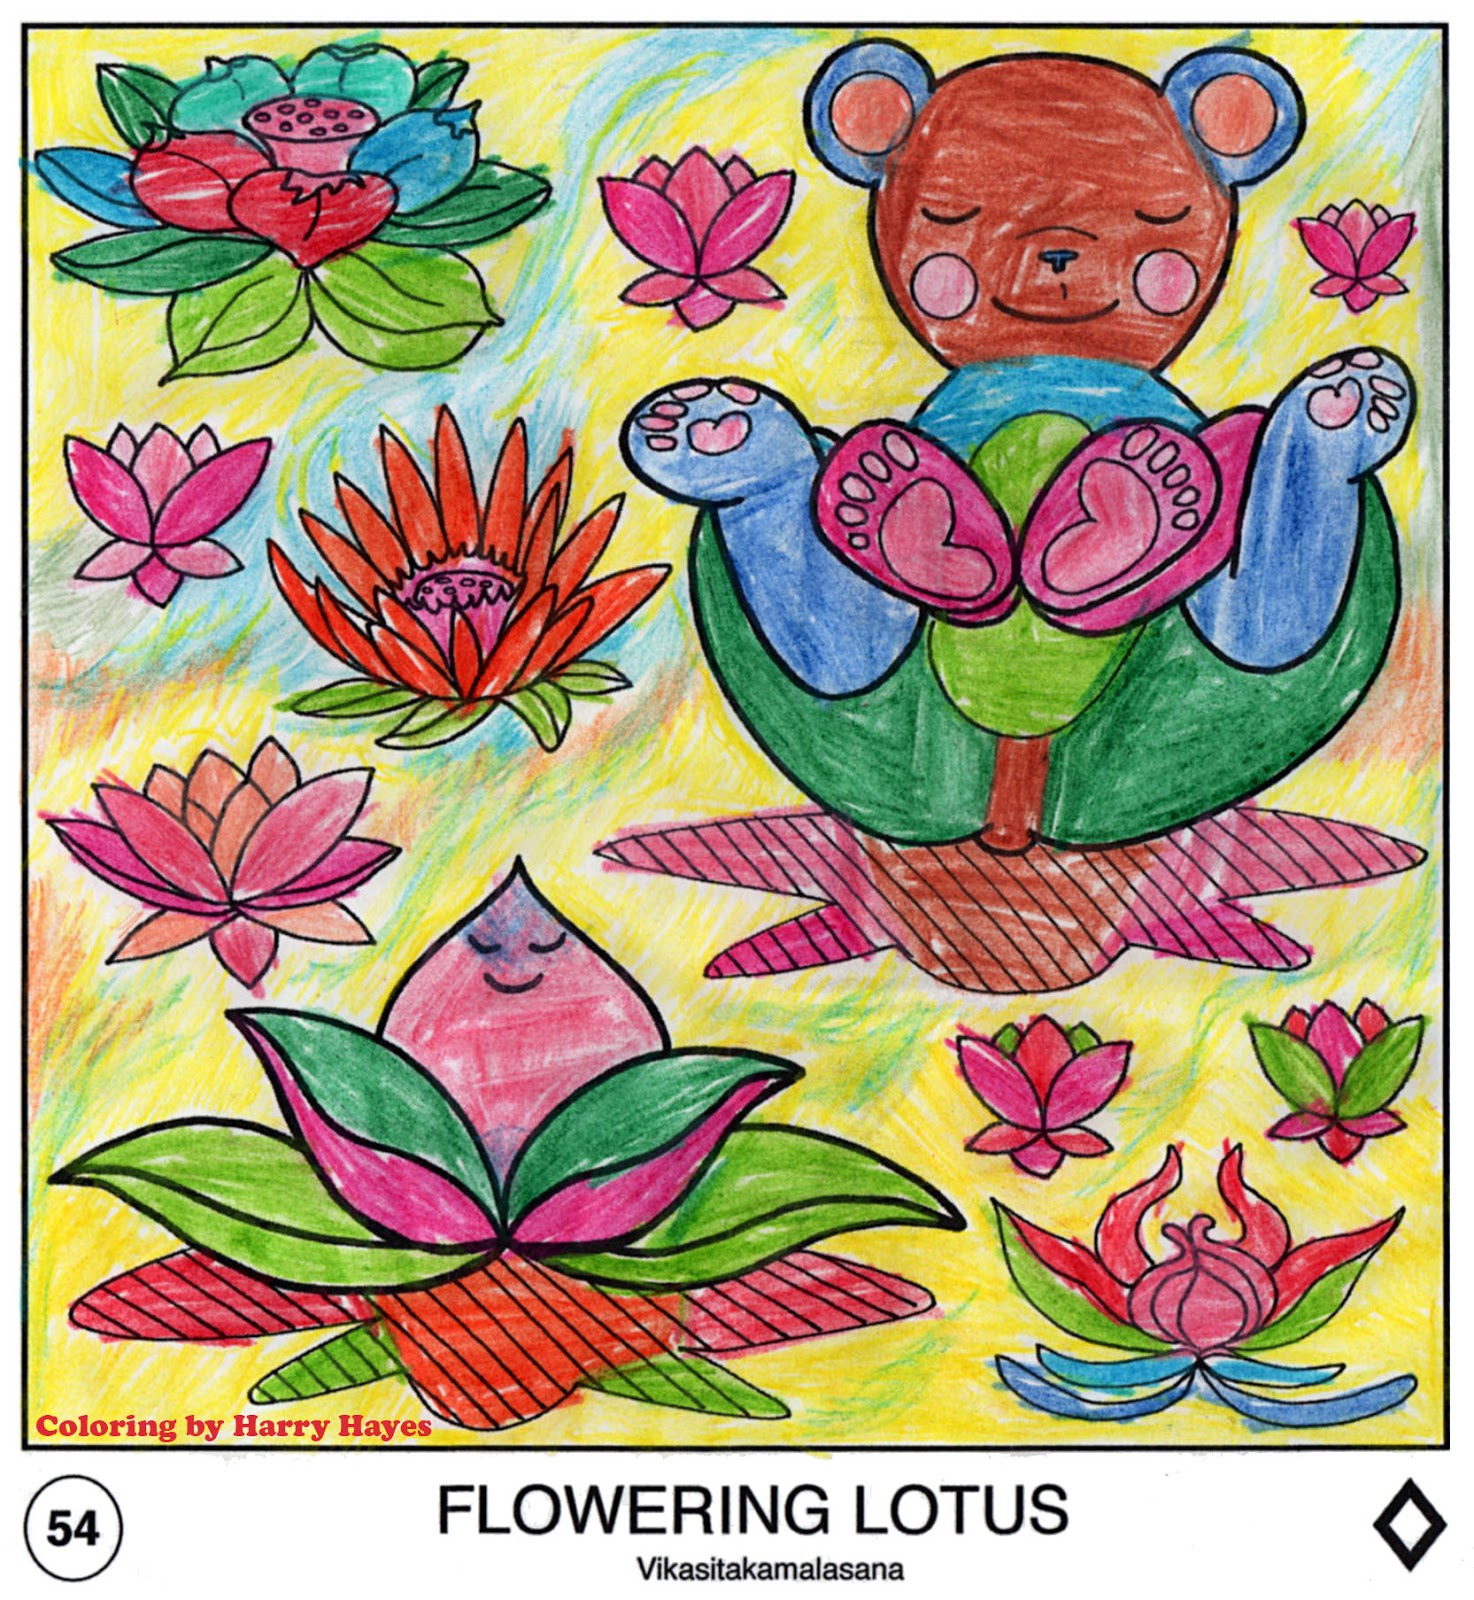 Yoga Teddy Bear A Flowering Lotus In Honor Of Mothers Everywhere